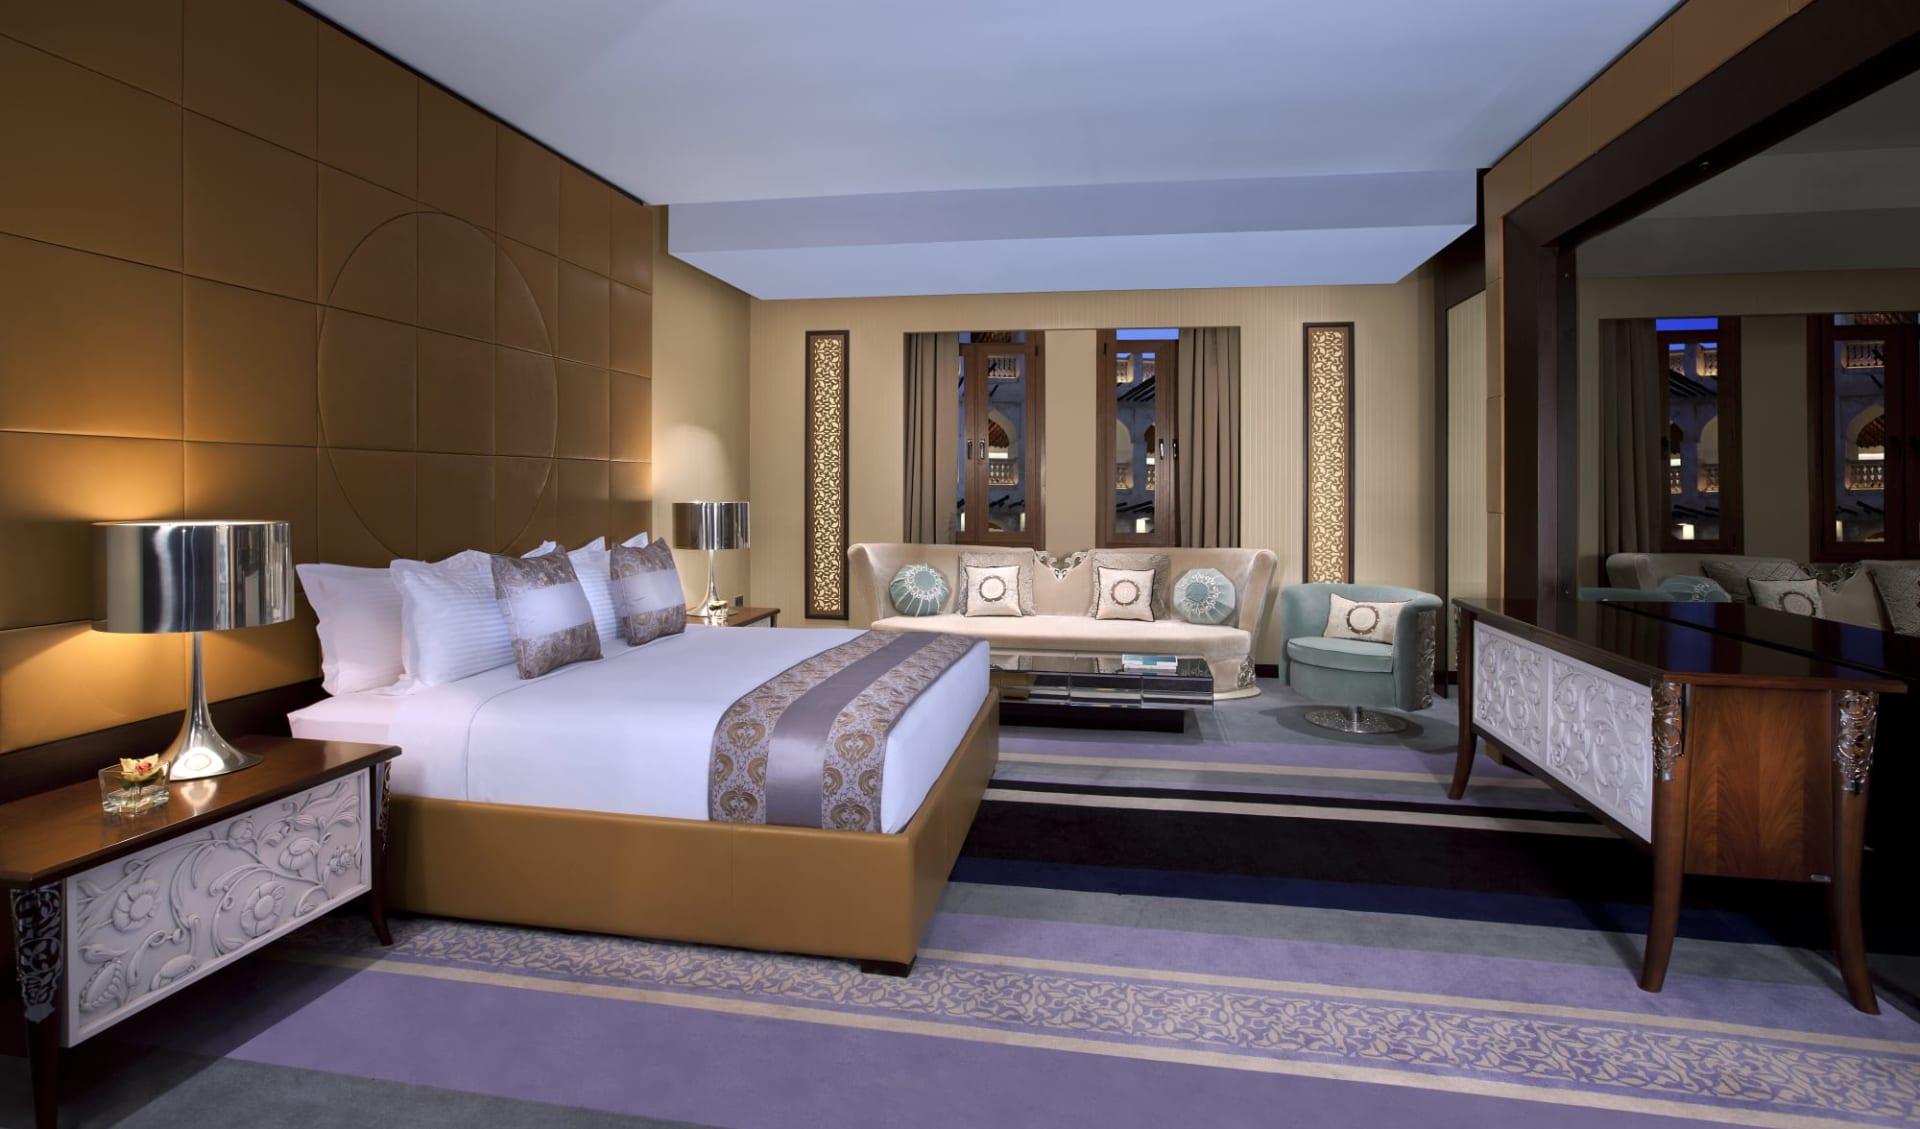 Souq Waqif Boutique Hotels in Doha:  Amiri suite